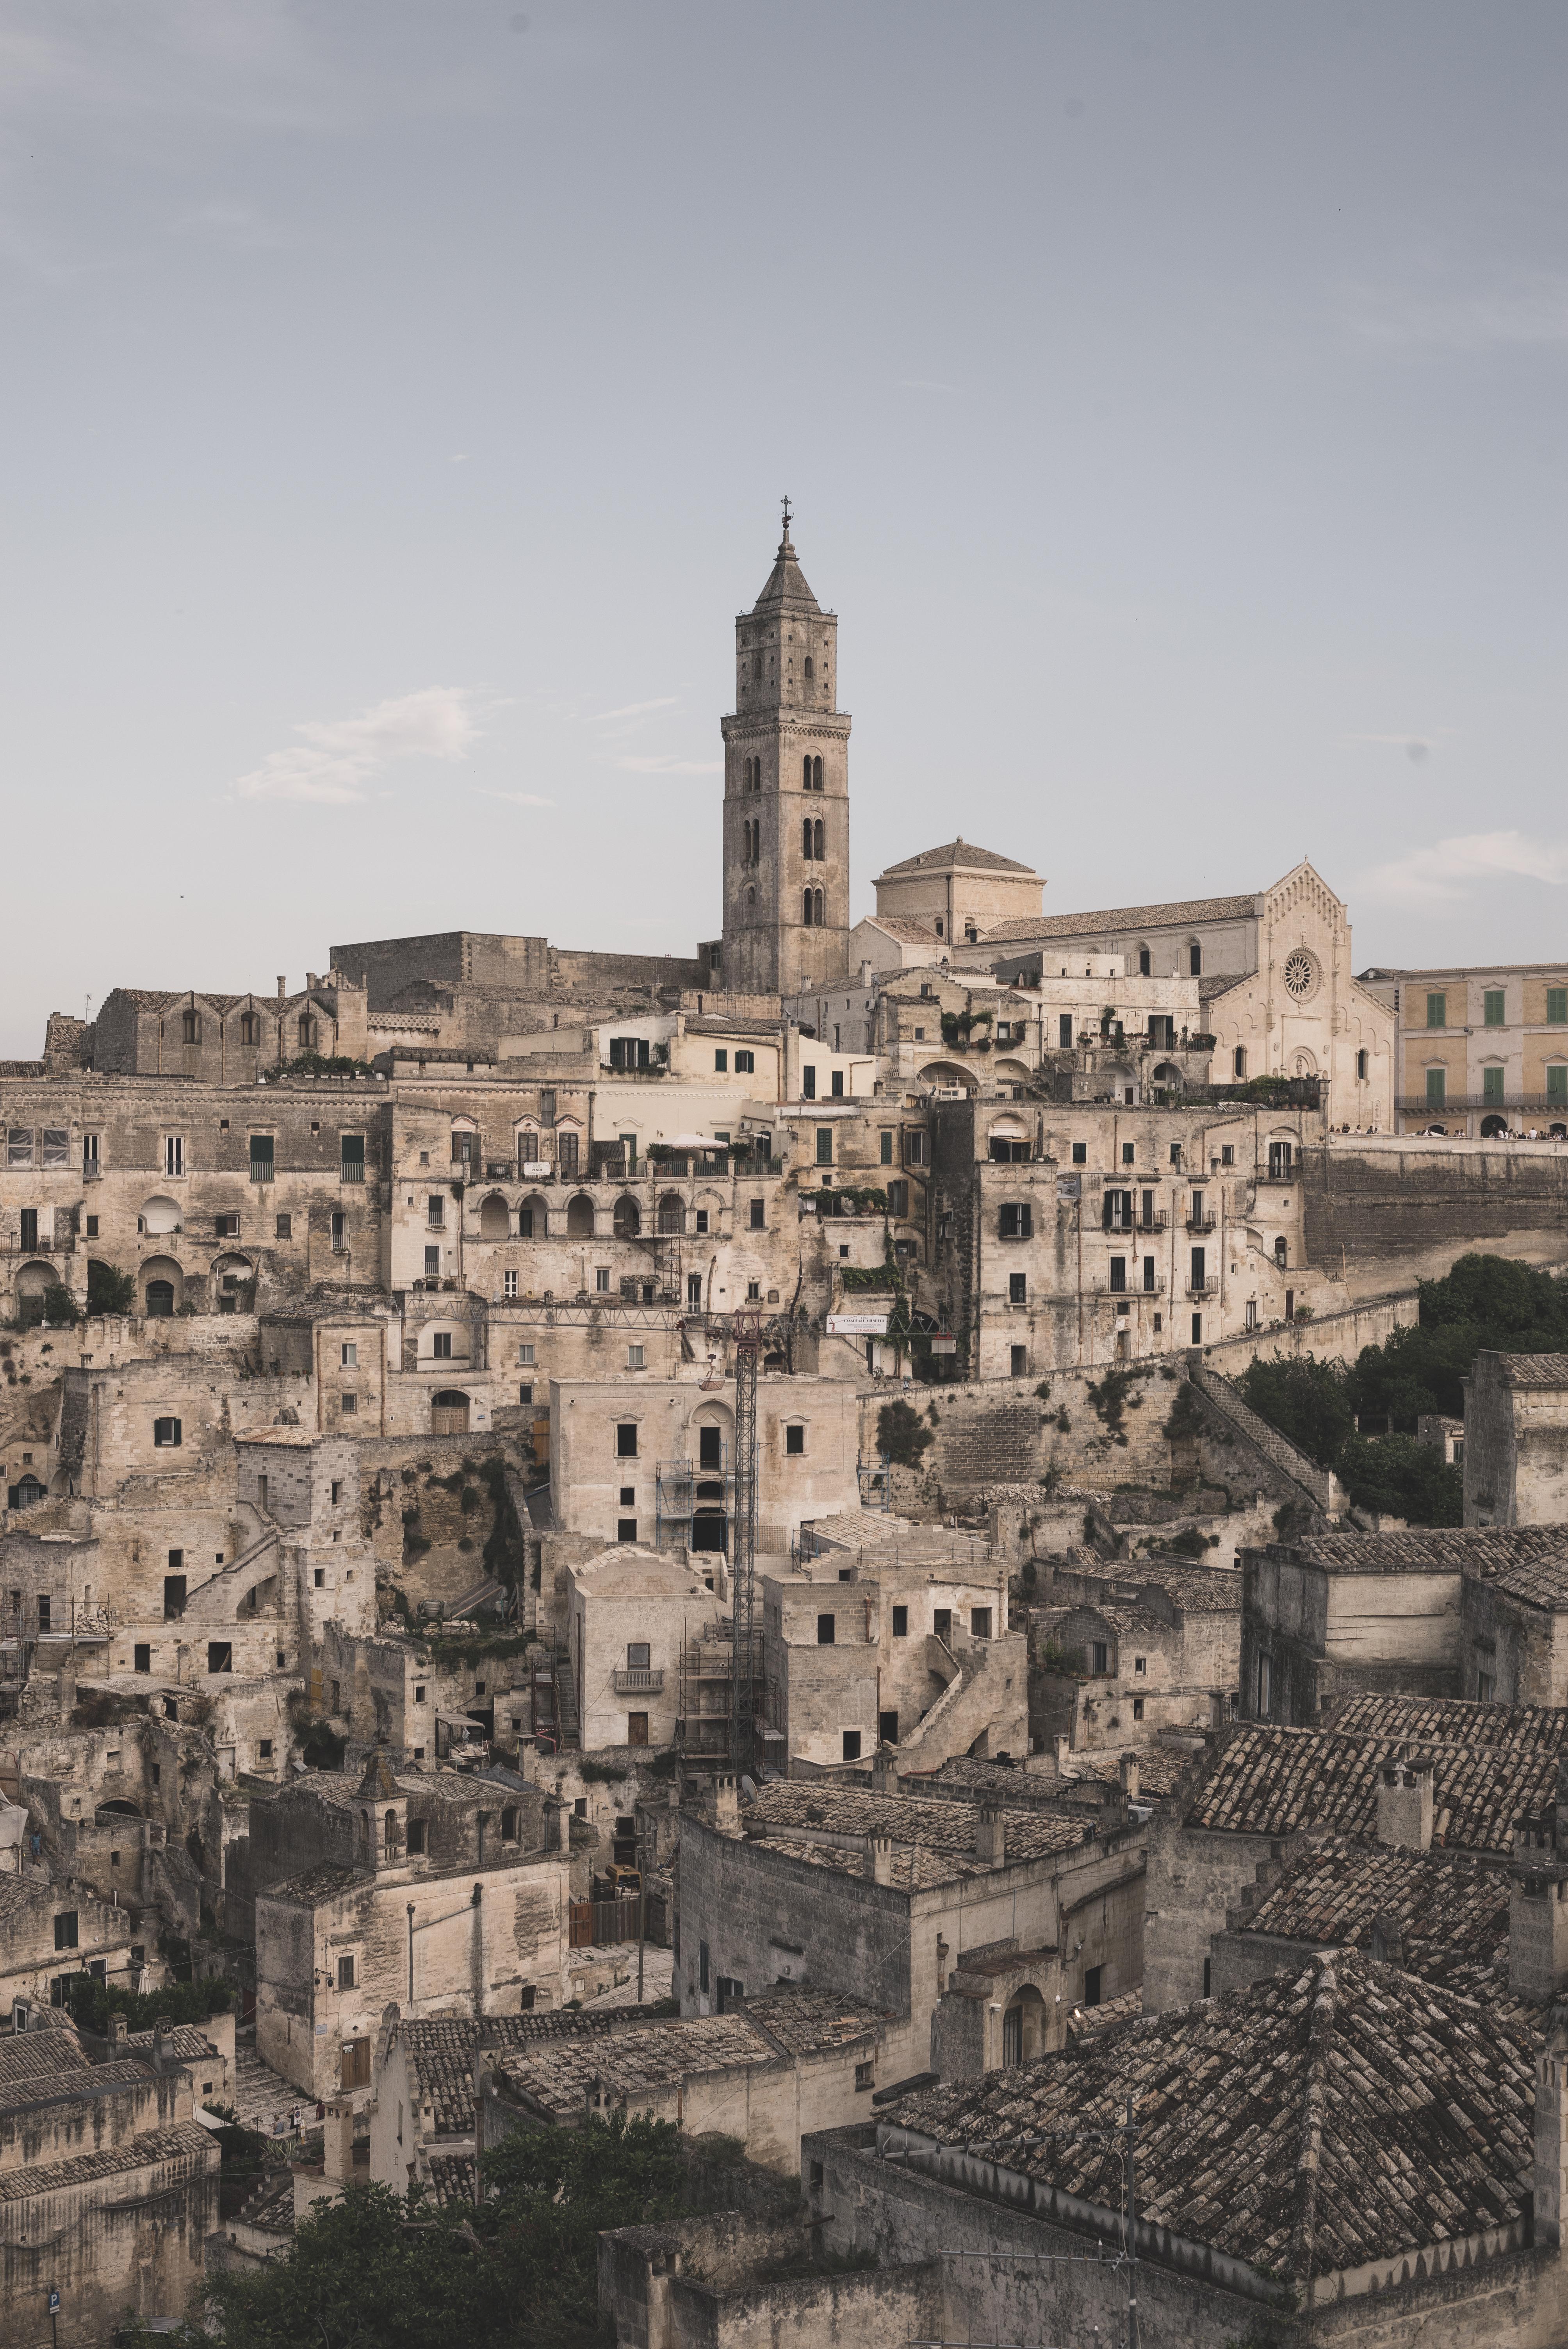 Holiday in Italy, matera, travel photography